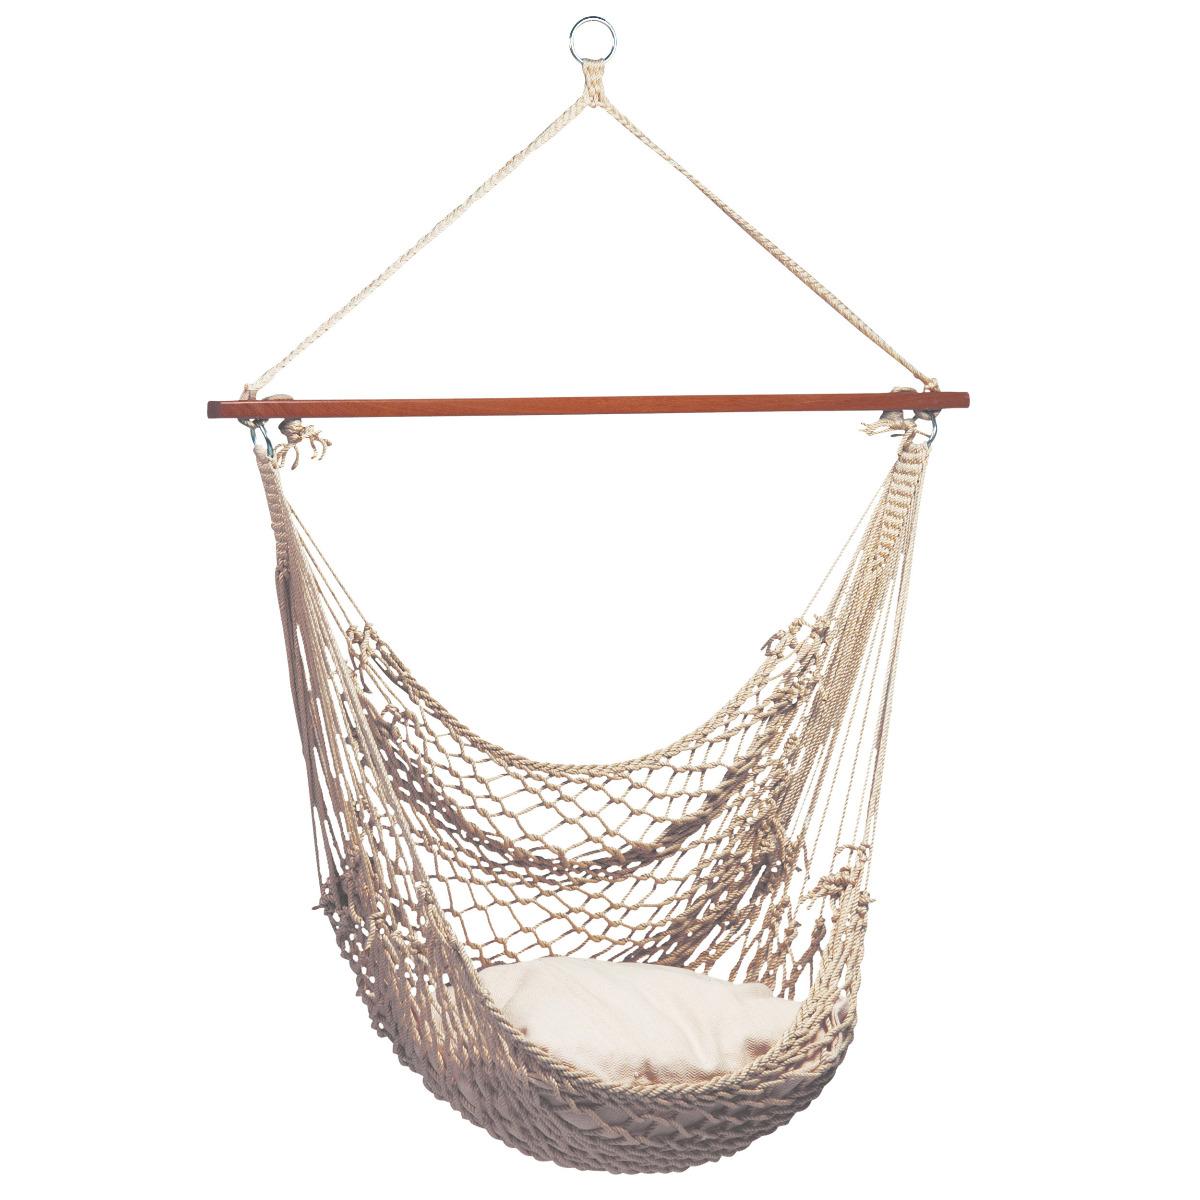 'Rope' Natura Hangstoel - Wit - Ecru - Tropilex �